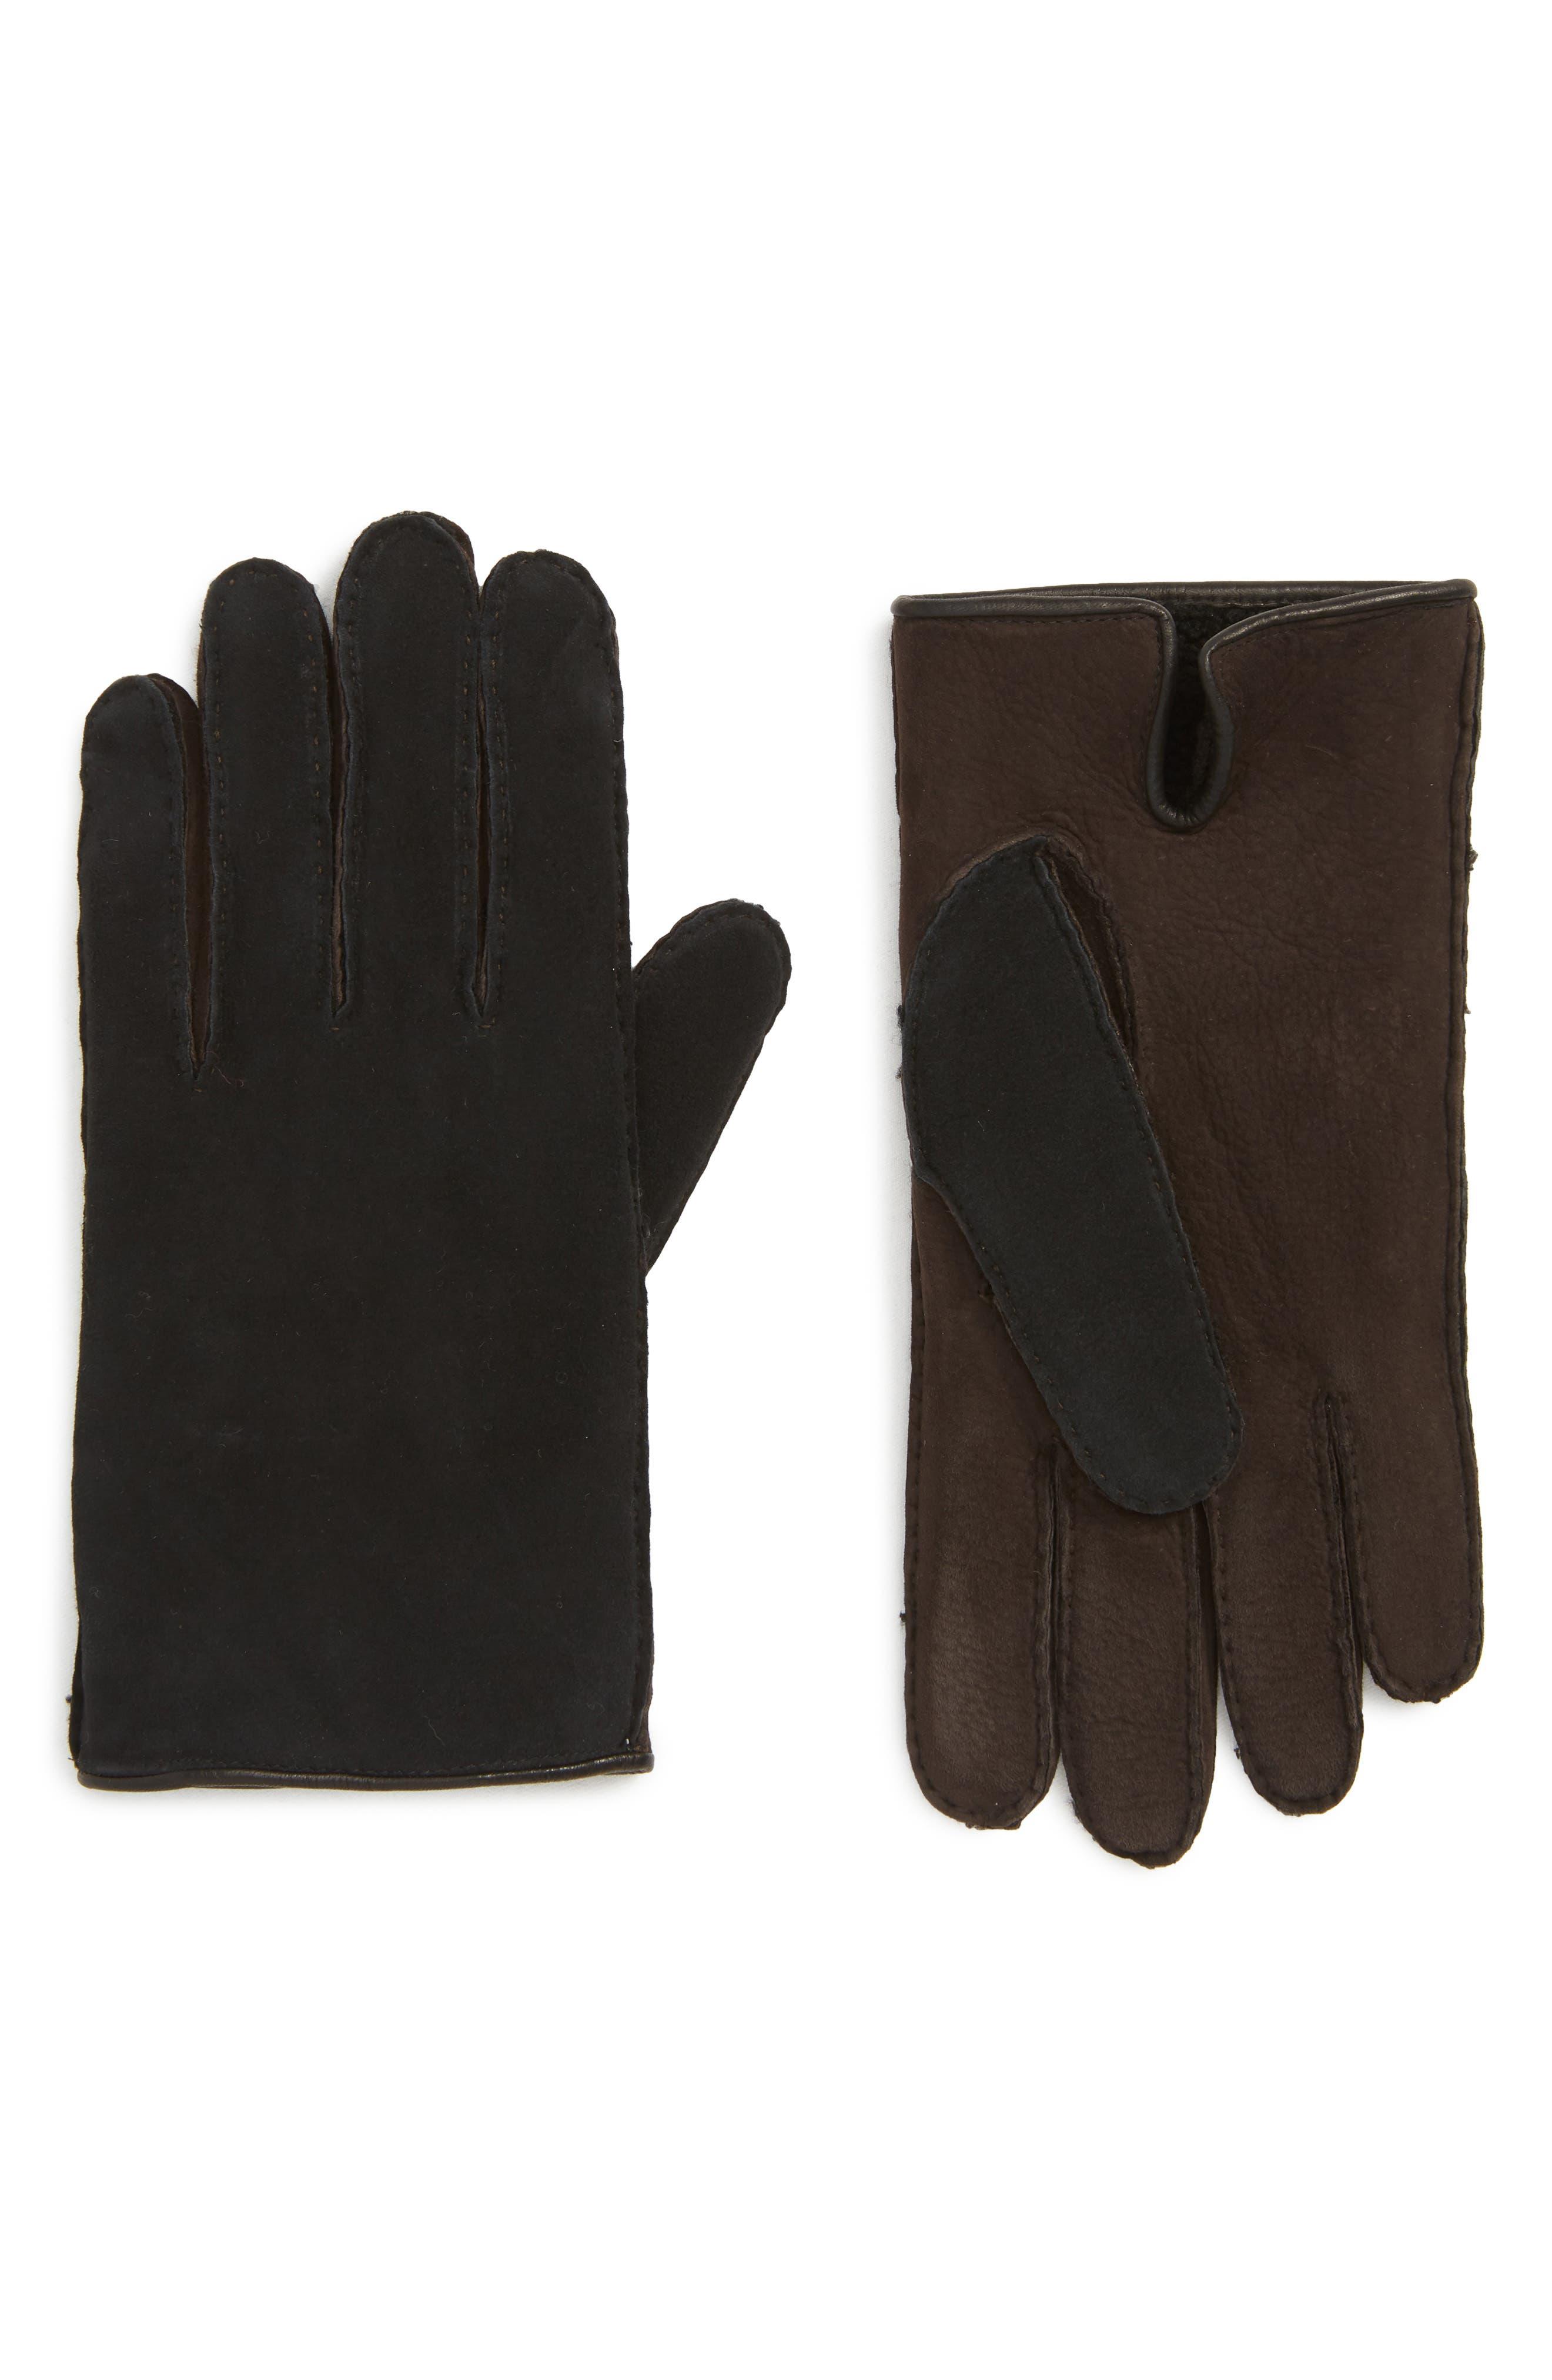 Leather Gloves,                         Main,                         color, BLACK/ BROWN